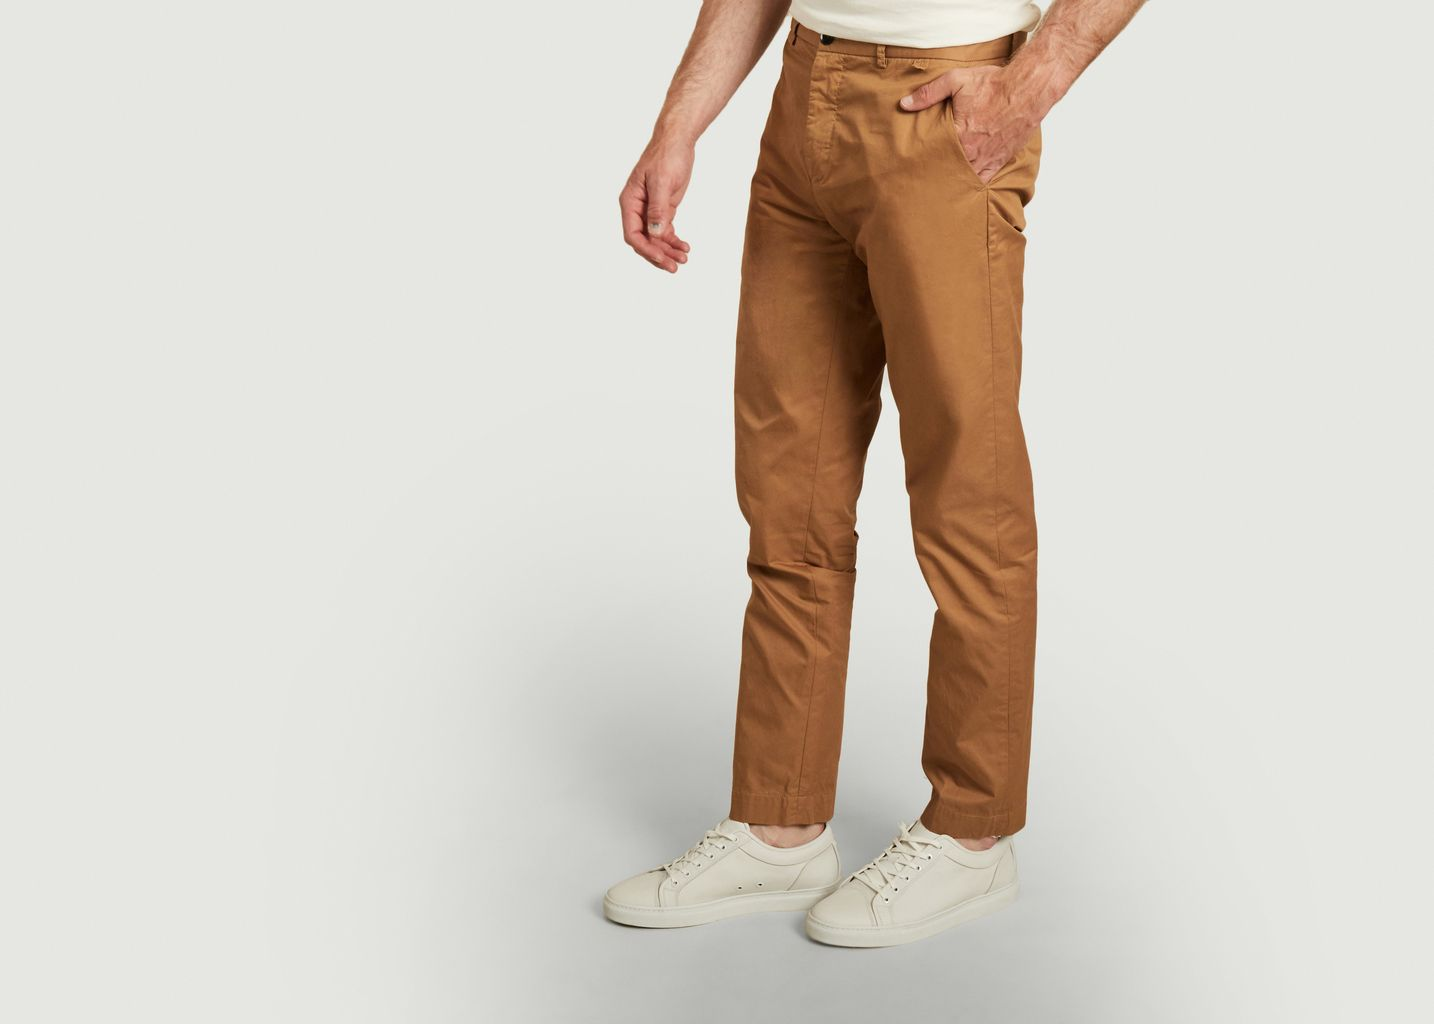 Pantalon chino Officer - A.B.C.L. Garments